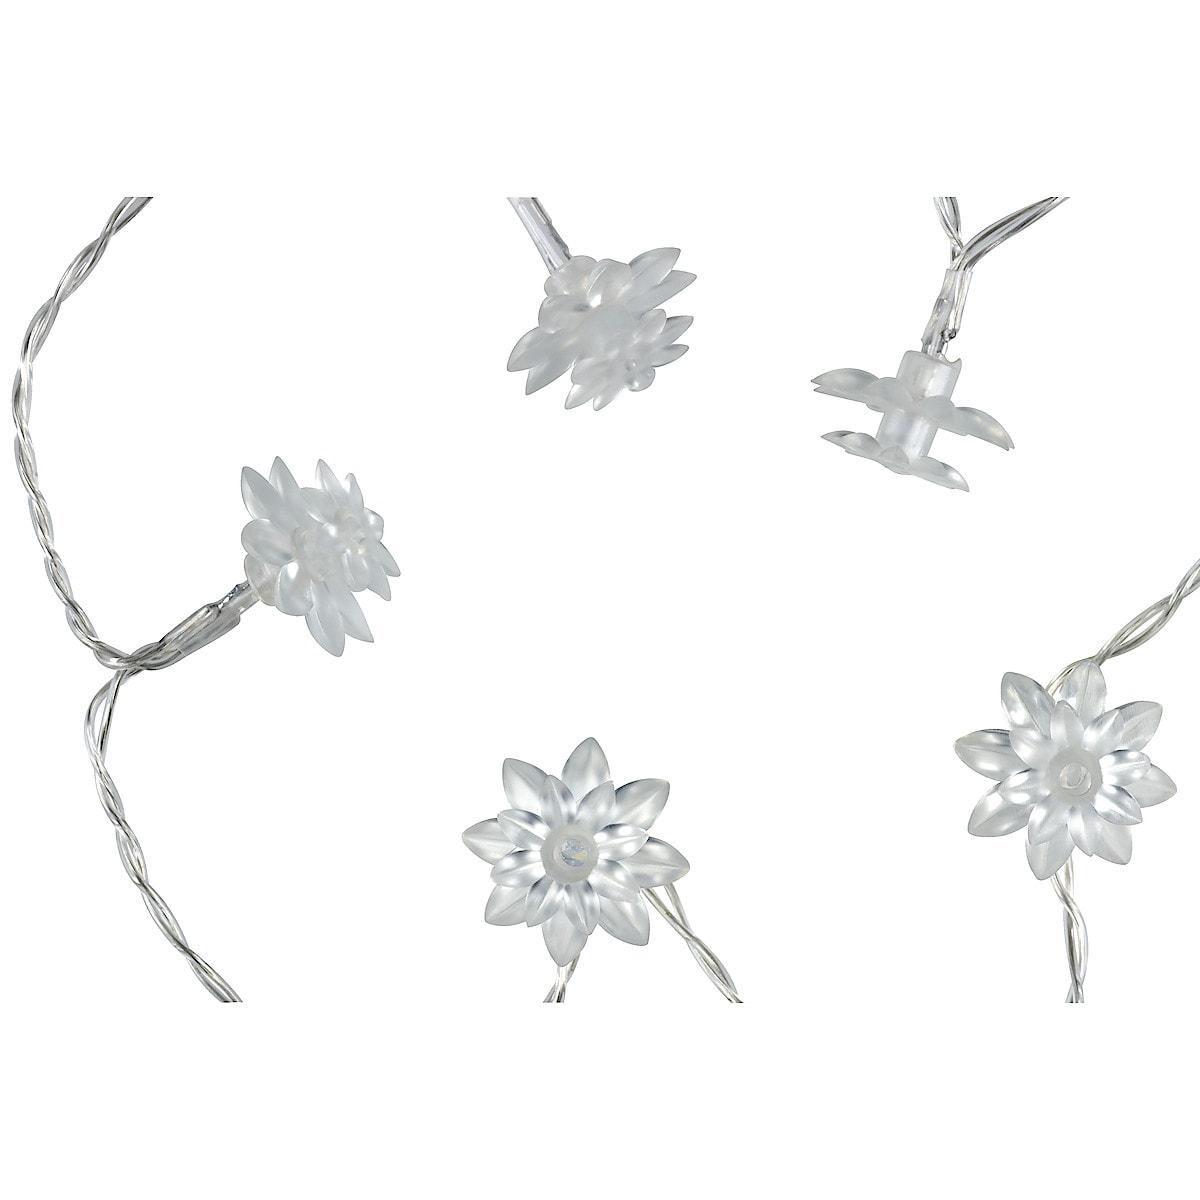 Flower LED string lights